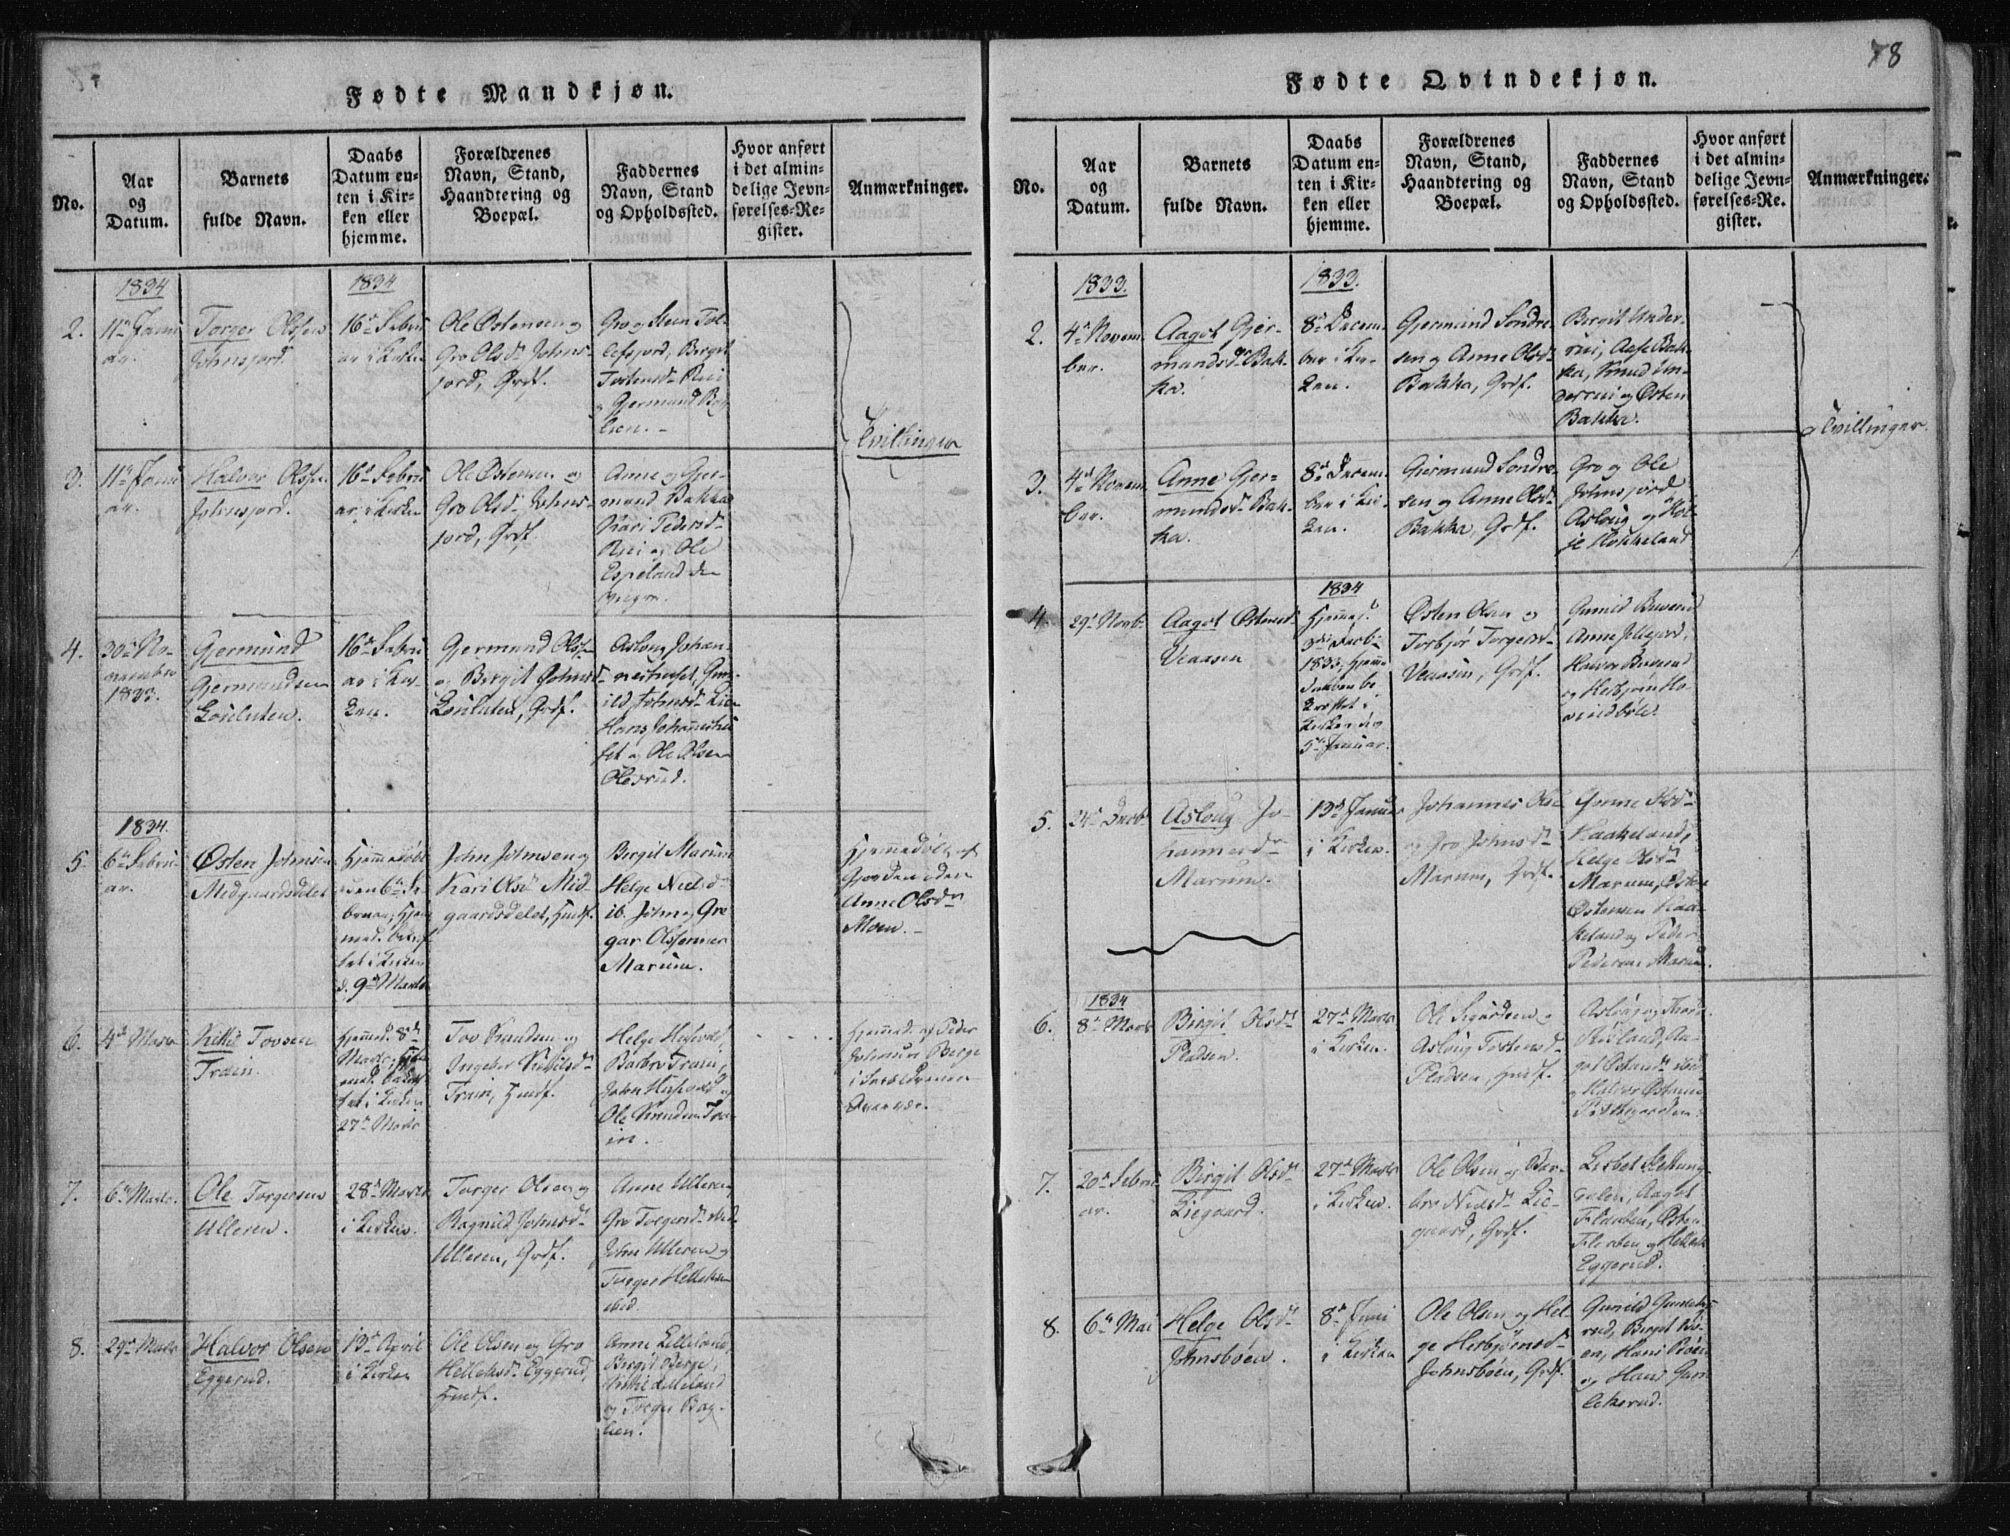 SAKO, Tinn kirkebøker, F/Fa/L0004: Ministerialbok nr. I 4, 1815-1843, s. 78